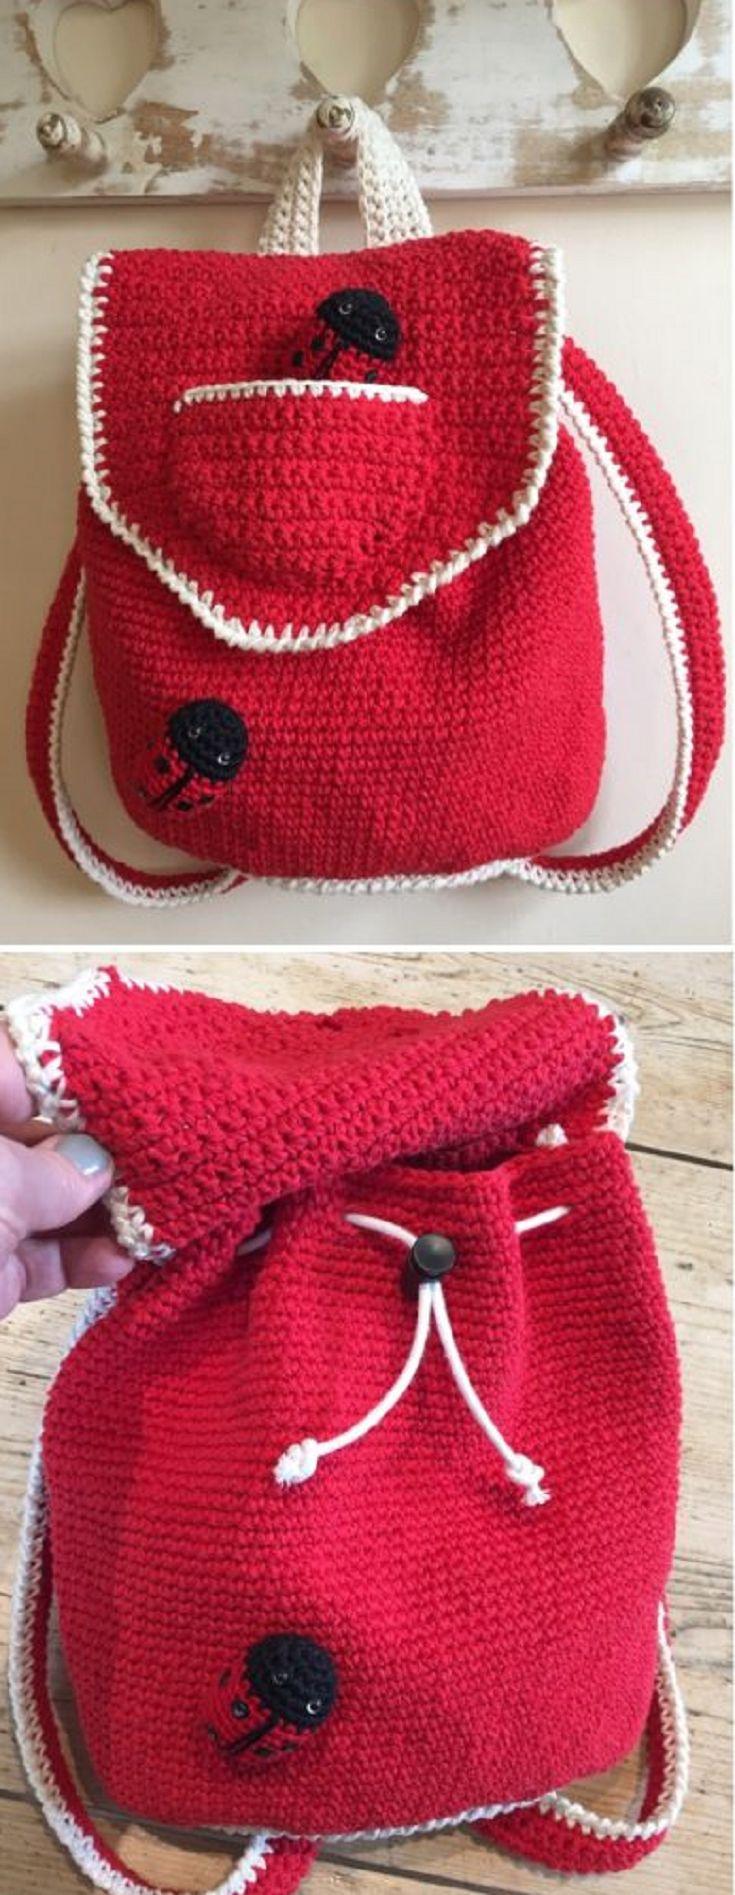 Crochet Pattern: Little Backpack!•★•Teresa Restegui http://www.pinterest.com/teretegui/•★•